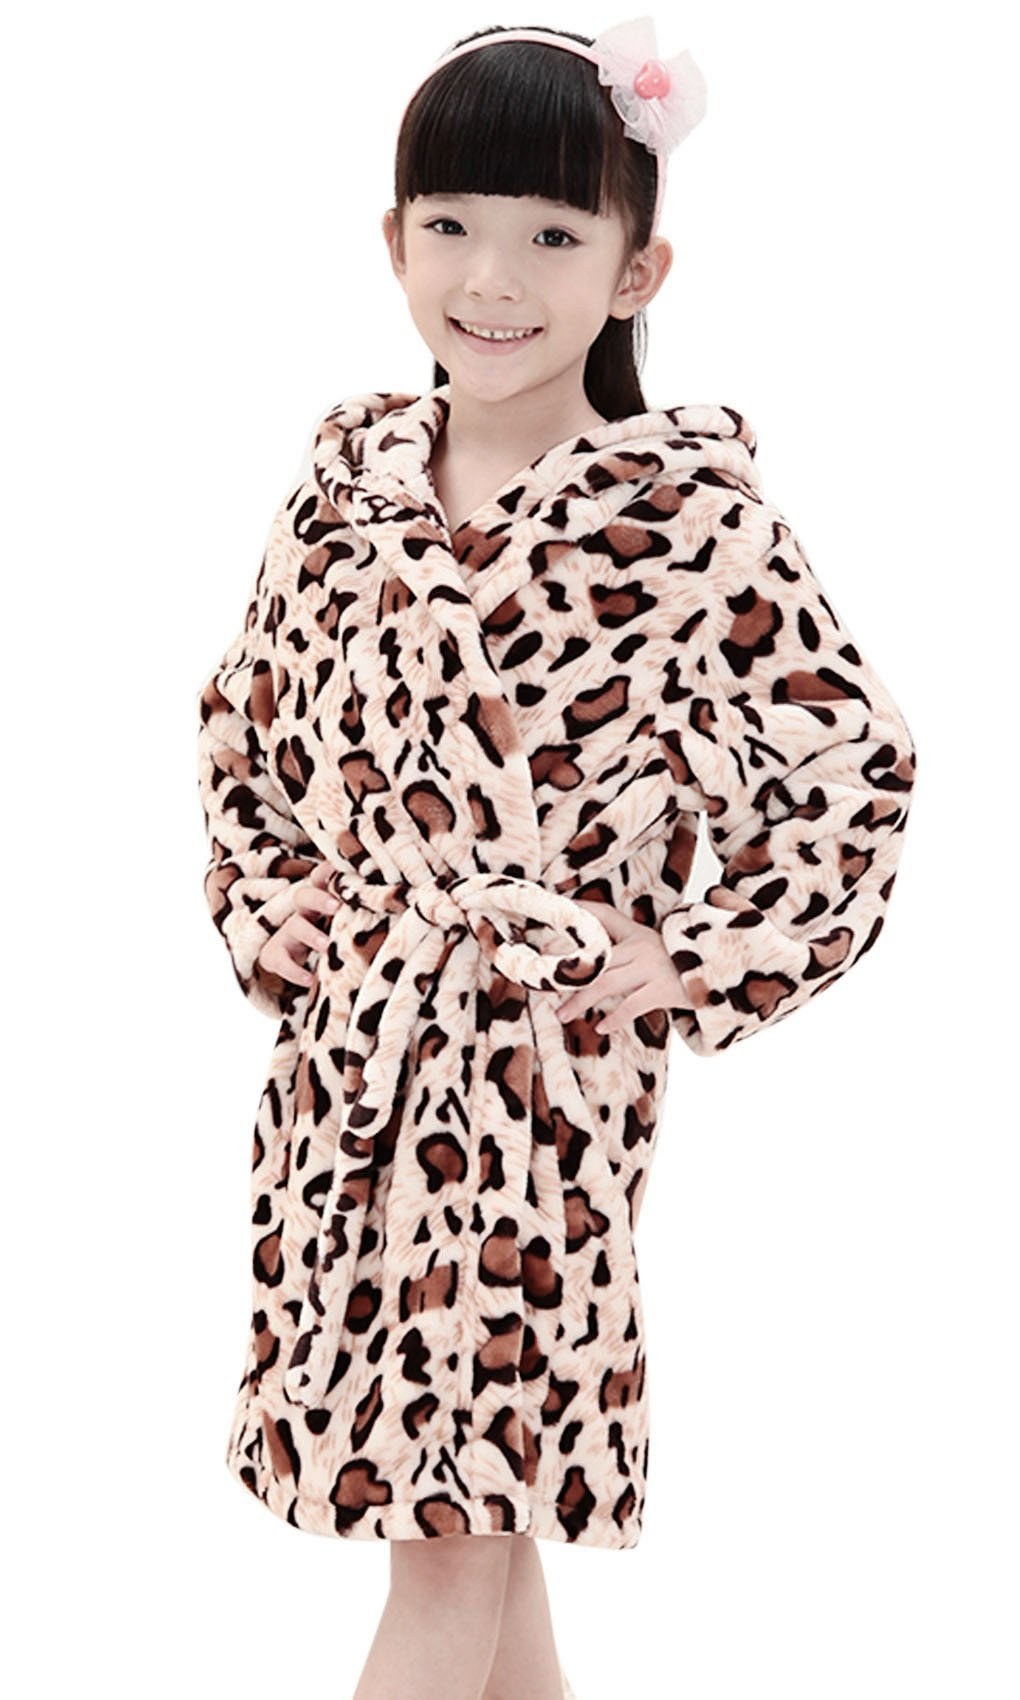 Starsource Kids Boys Girls Winter Fleece Plush Hooded Home Sleep Wear Pajamas Bath Robe